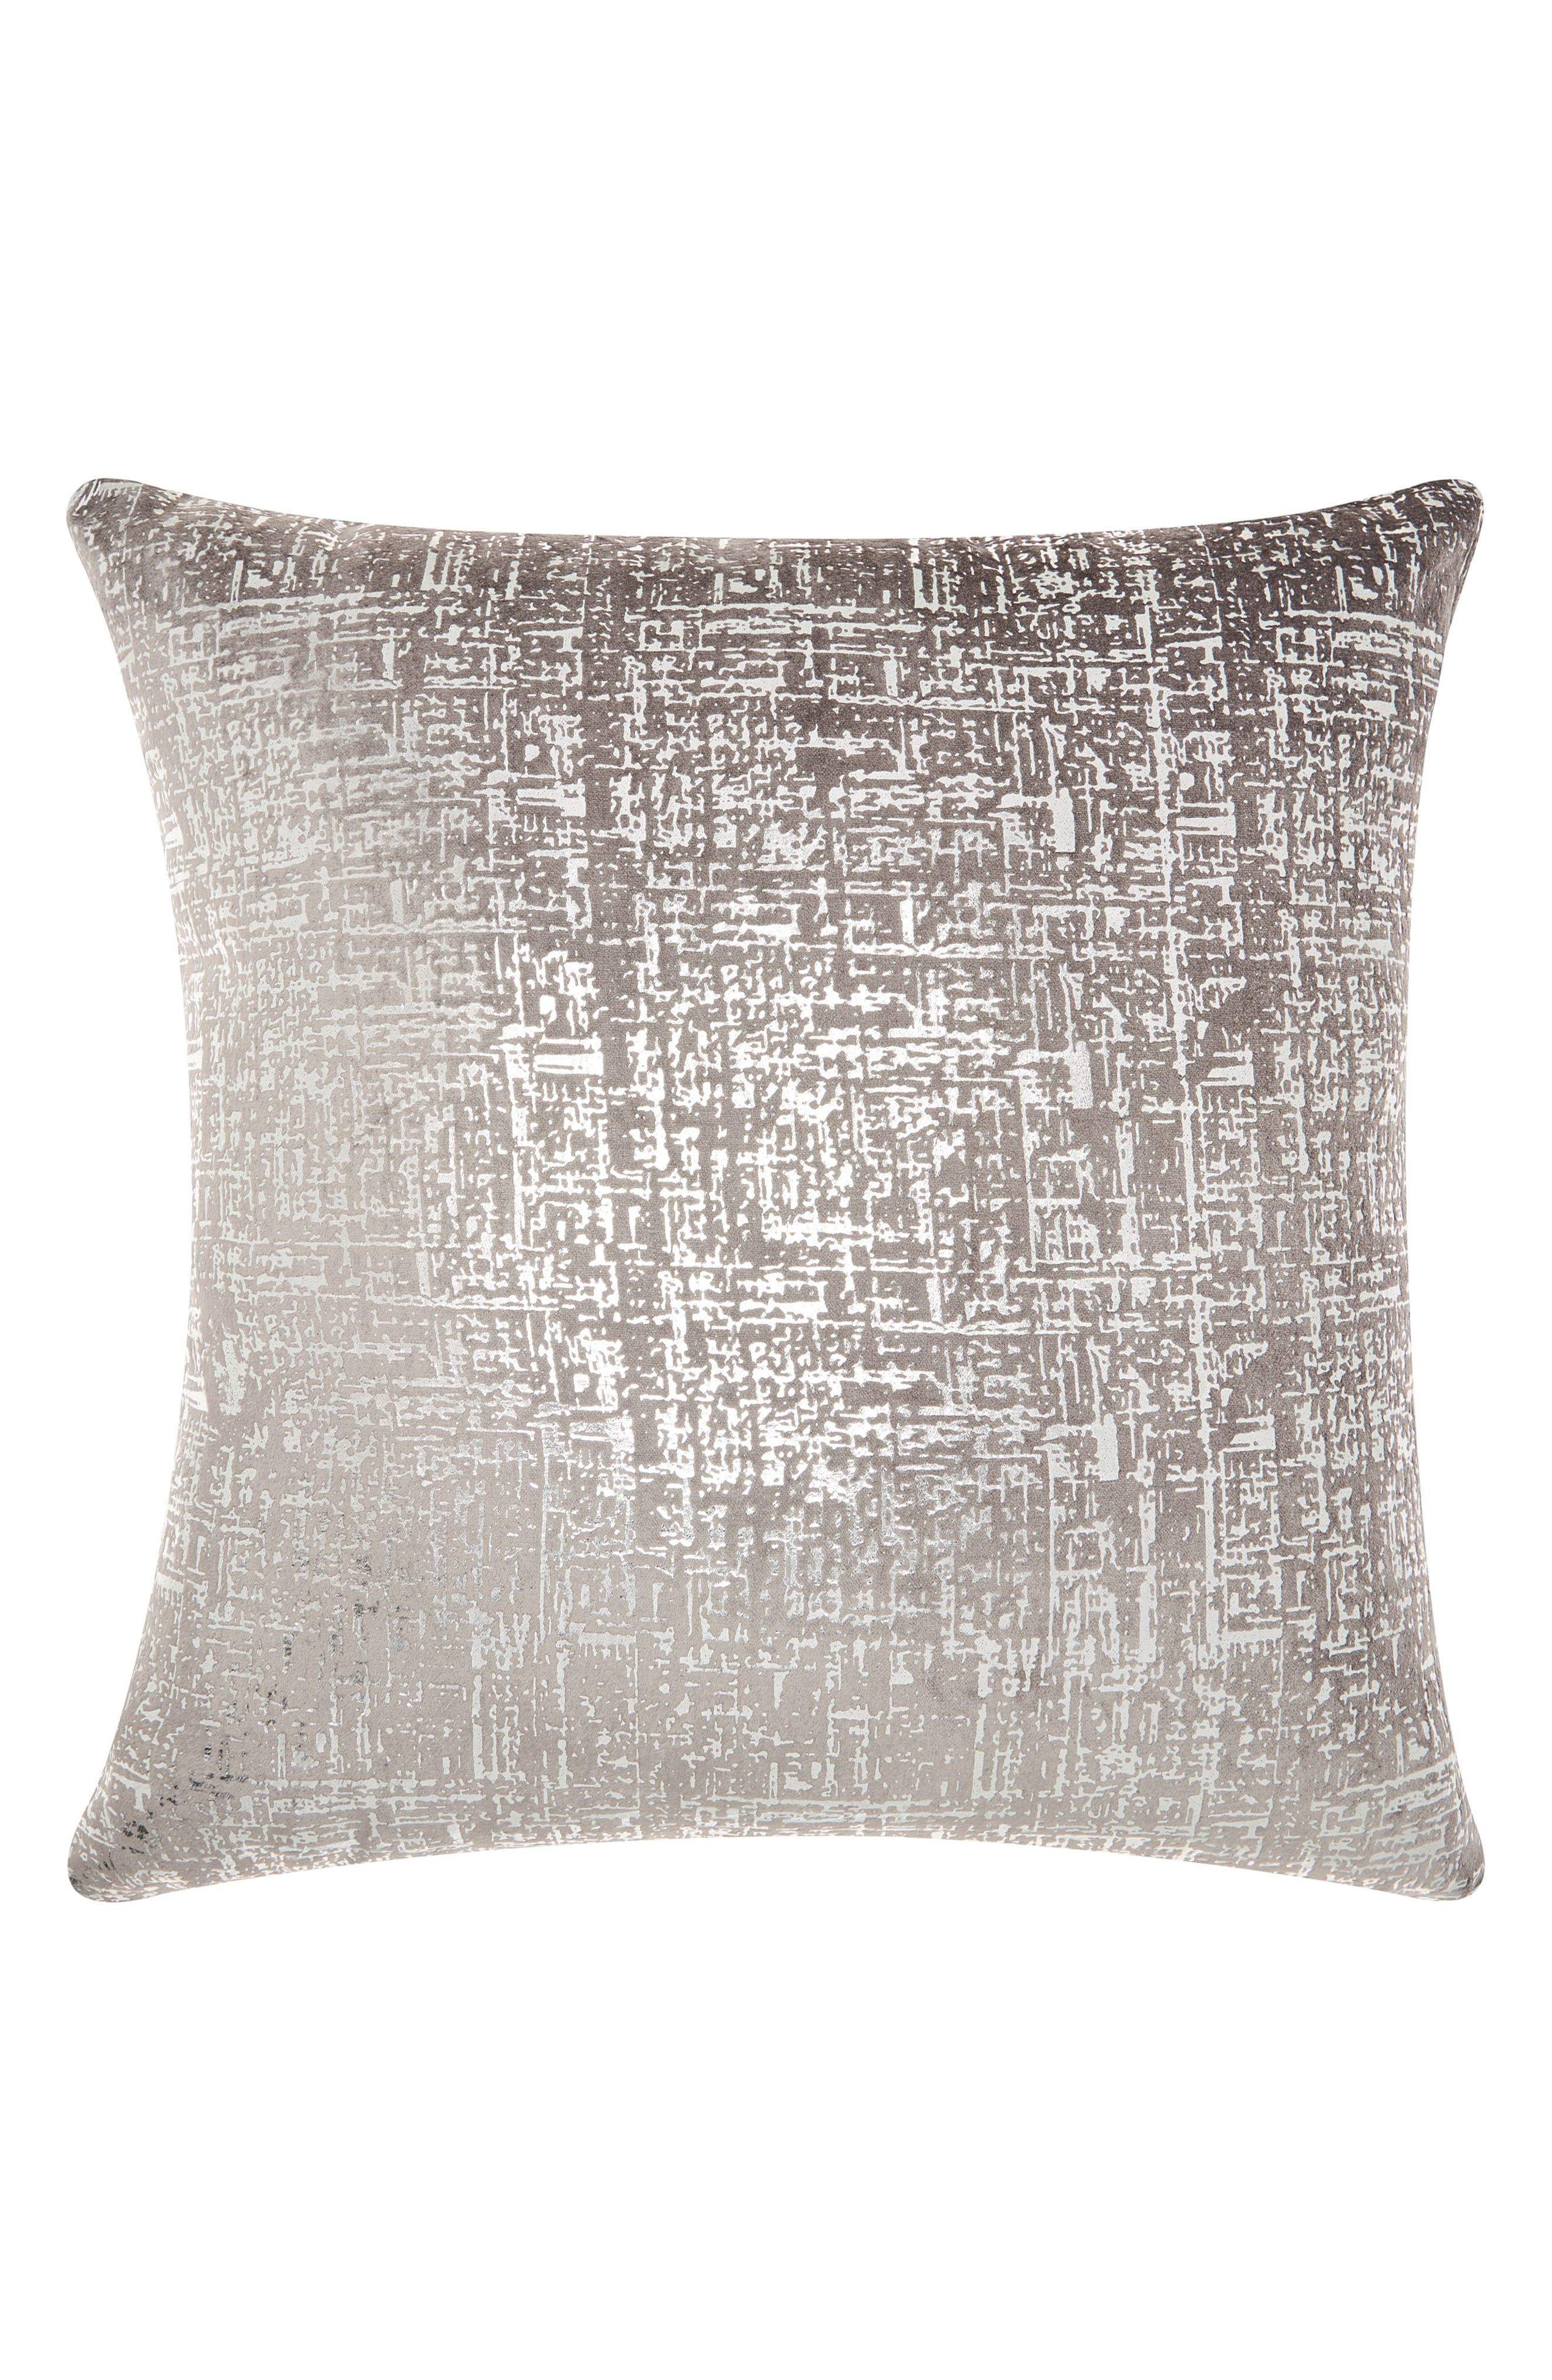 Distressed Velvet Accent Pillow,                             Main thumbnail 1, color,                             030